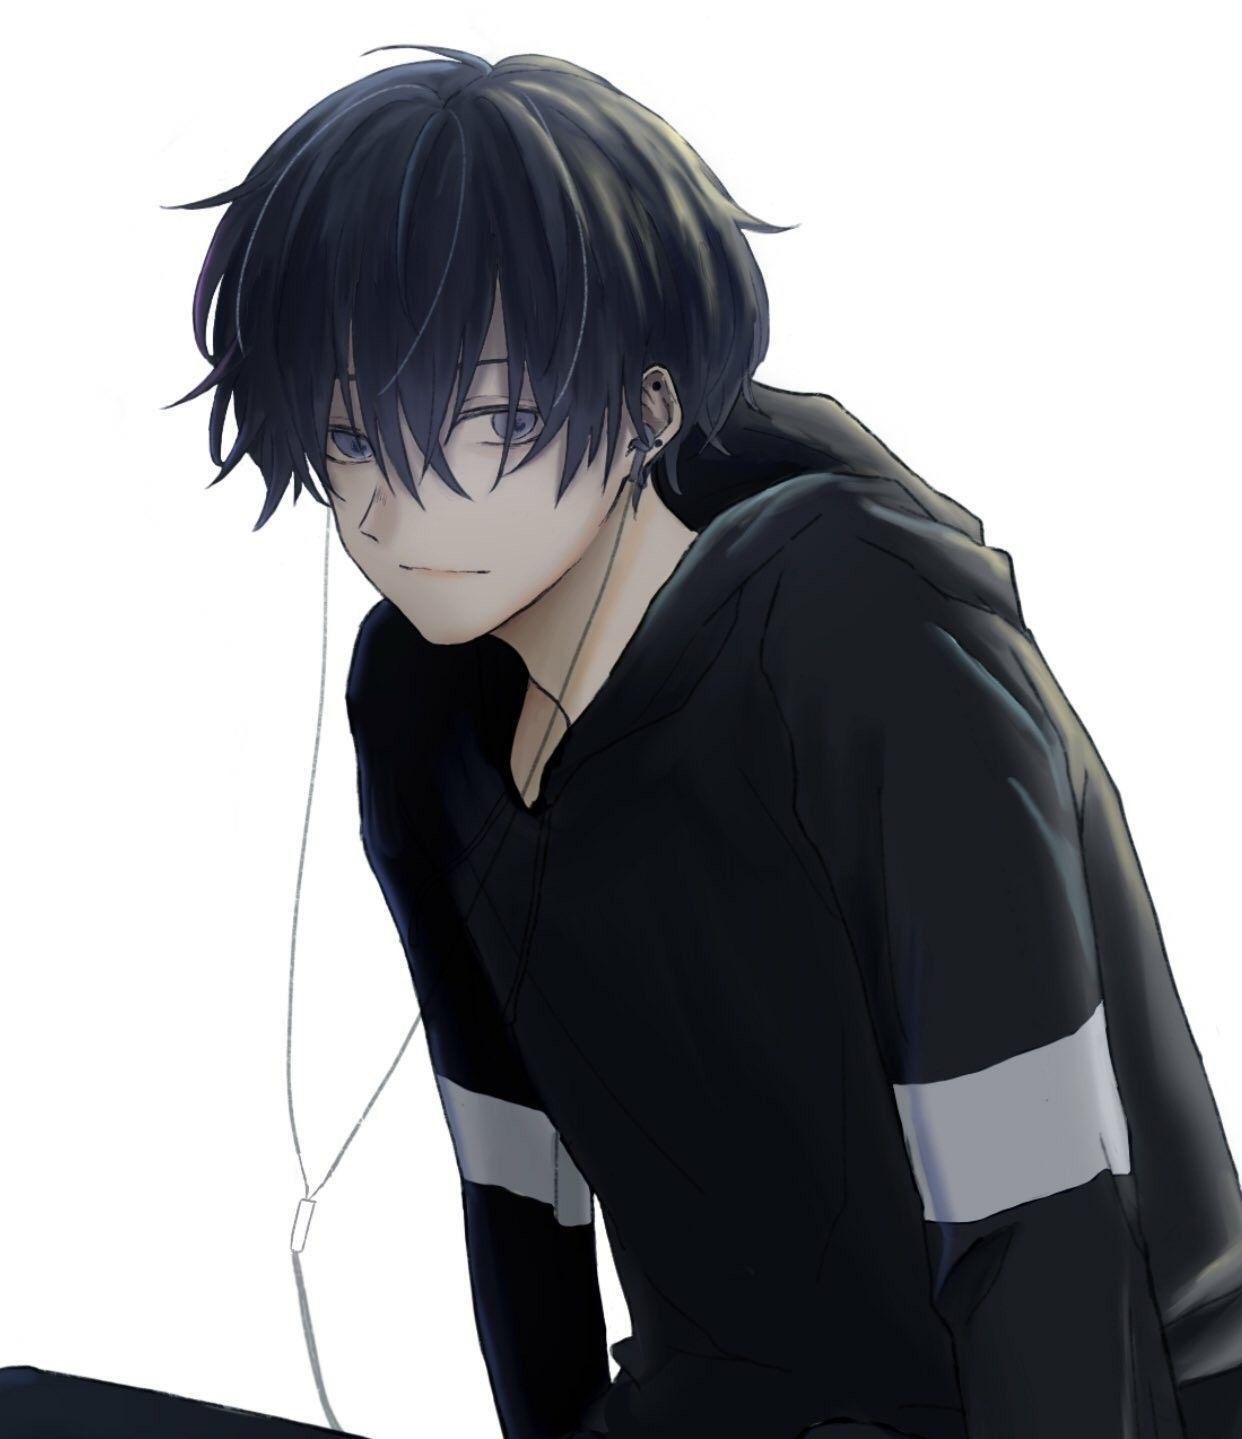 Save Follow 3 Strange Save Follow 3 Strange Animeaesthetic Animeboy Animedrawings Follow Save S In 2020 Anime Drawings Boy Cute Anime Boy Dark Anime